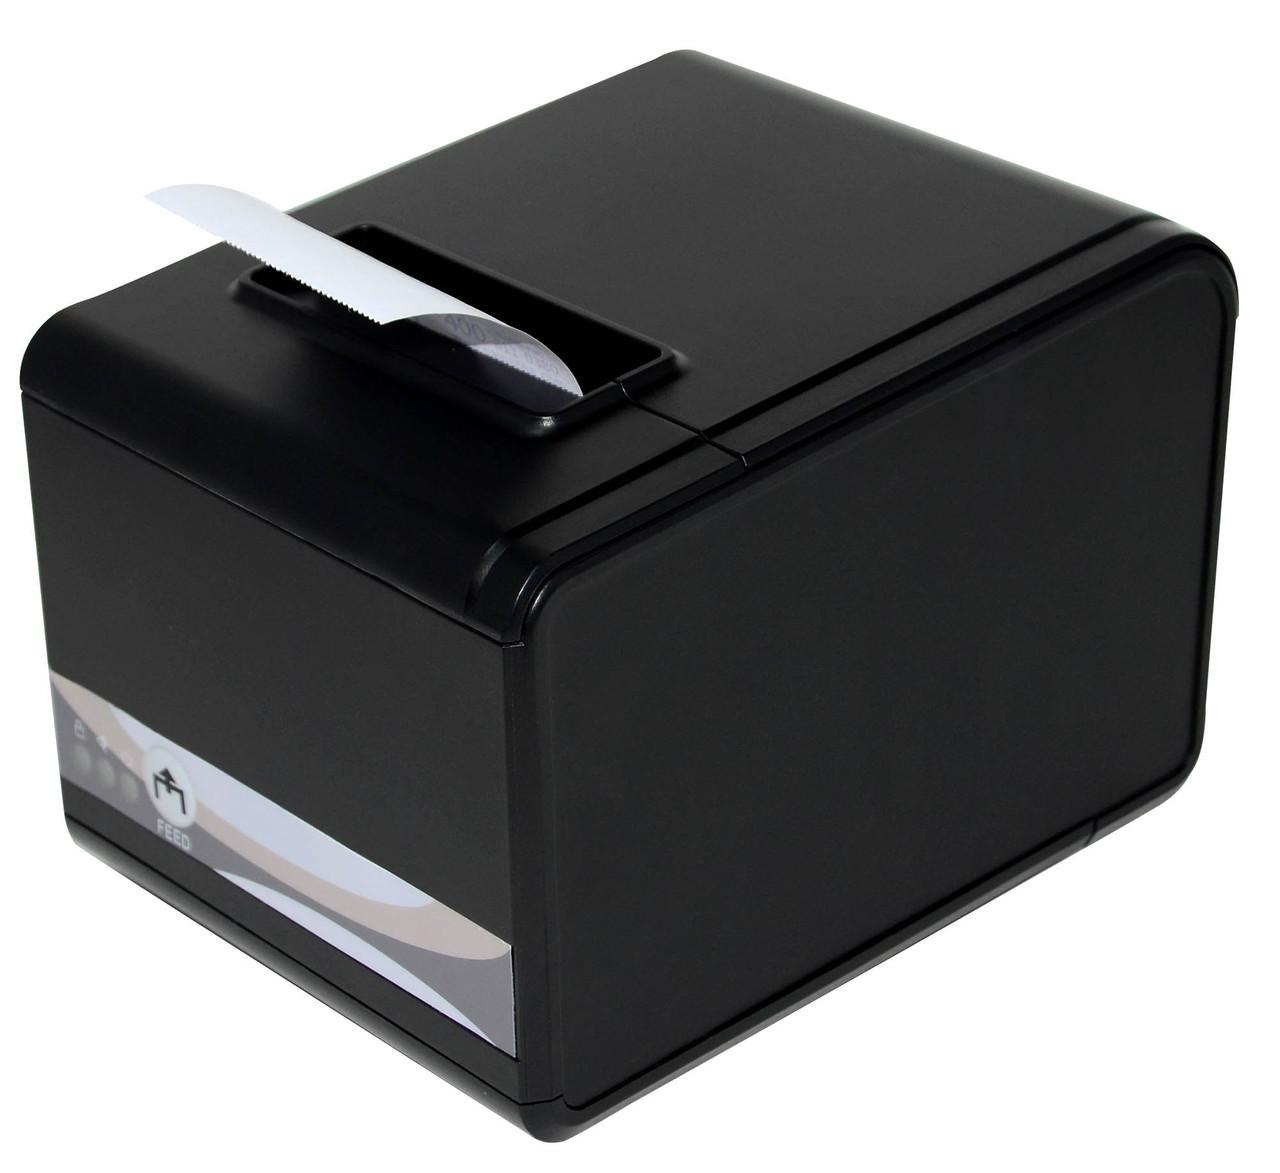 Термопринтер Gprinter L80250I